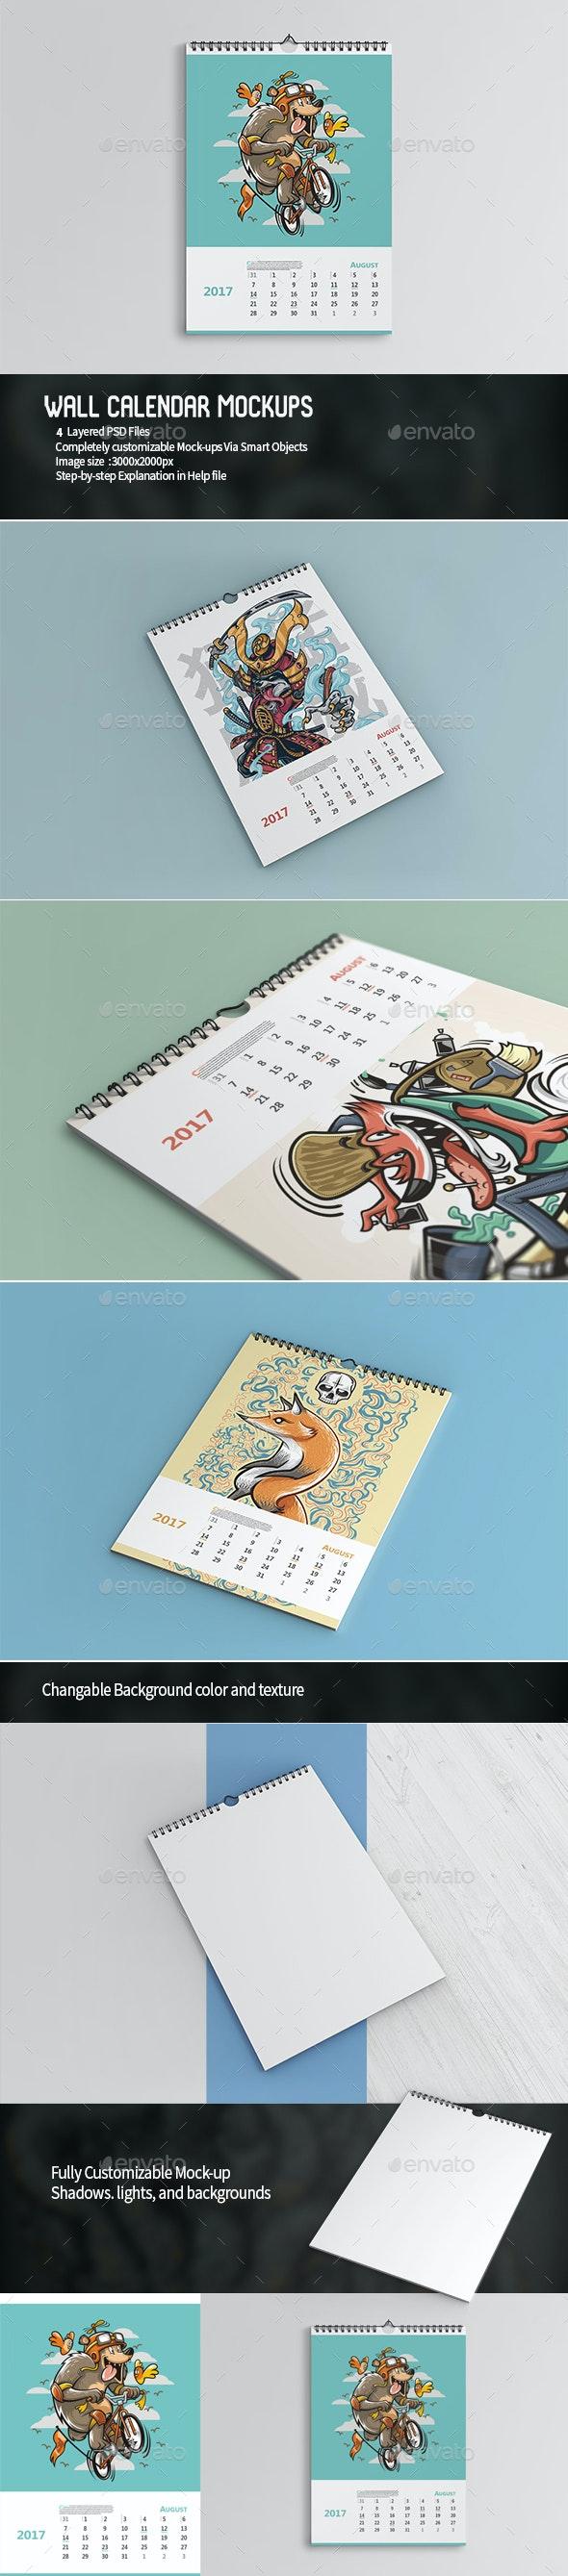 Wall Calendar Mockups - Miscellaneous Print